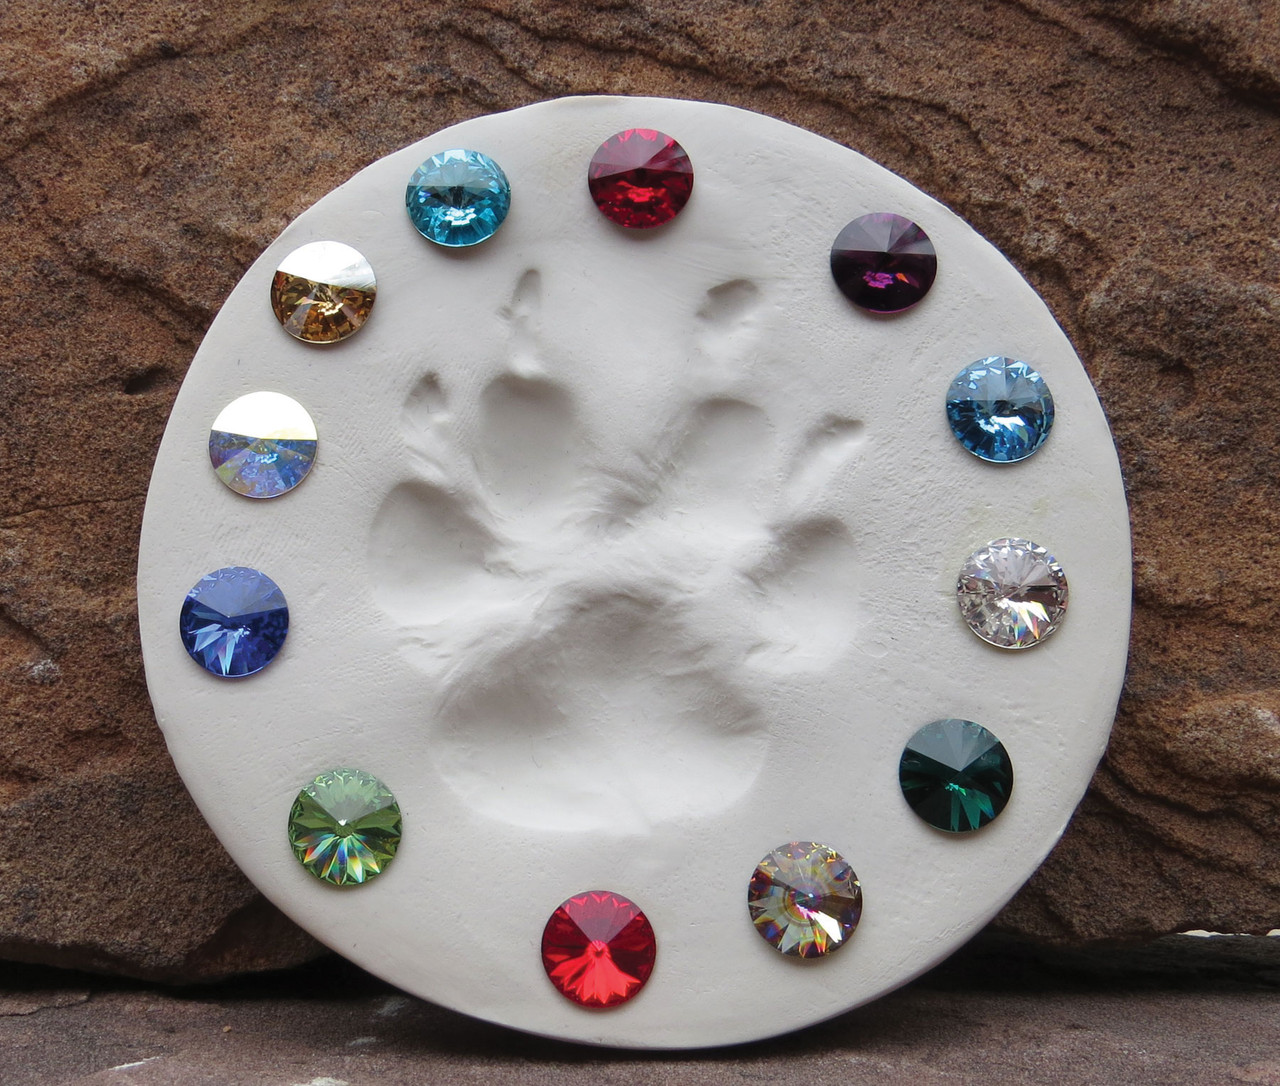 SCJUN - Swarovski Crystal Gemstones Alexandrite(June) 6 stones/pack.  For ClayPaws® Prints